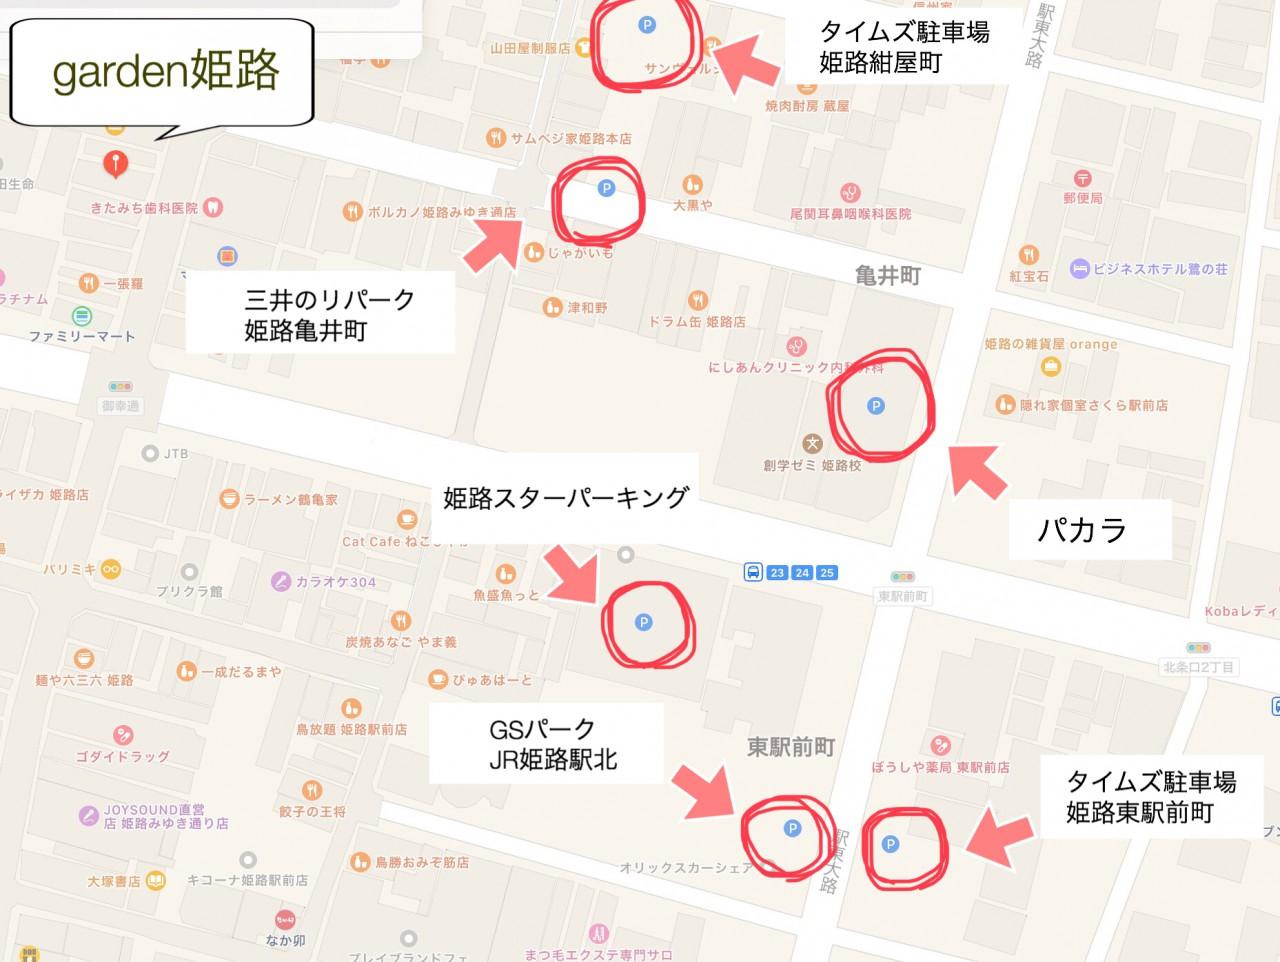 garden姫路近隣駐車場マップ